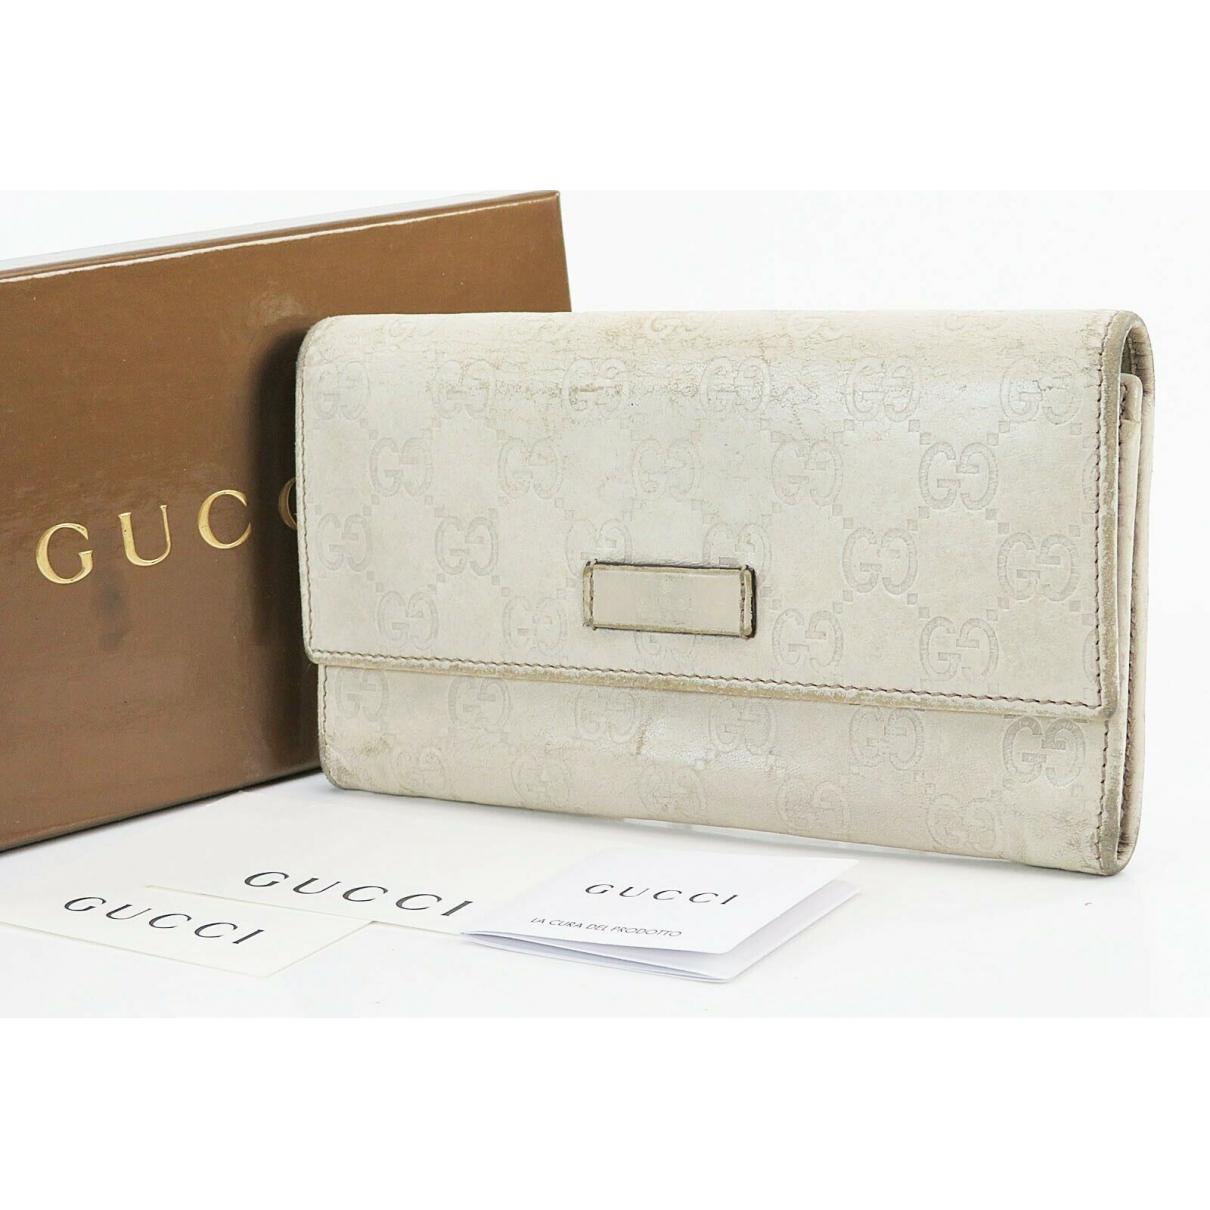 Chanel \N Leather Clutch bag for Women \N